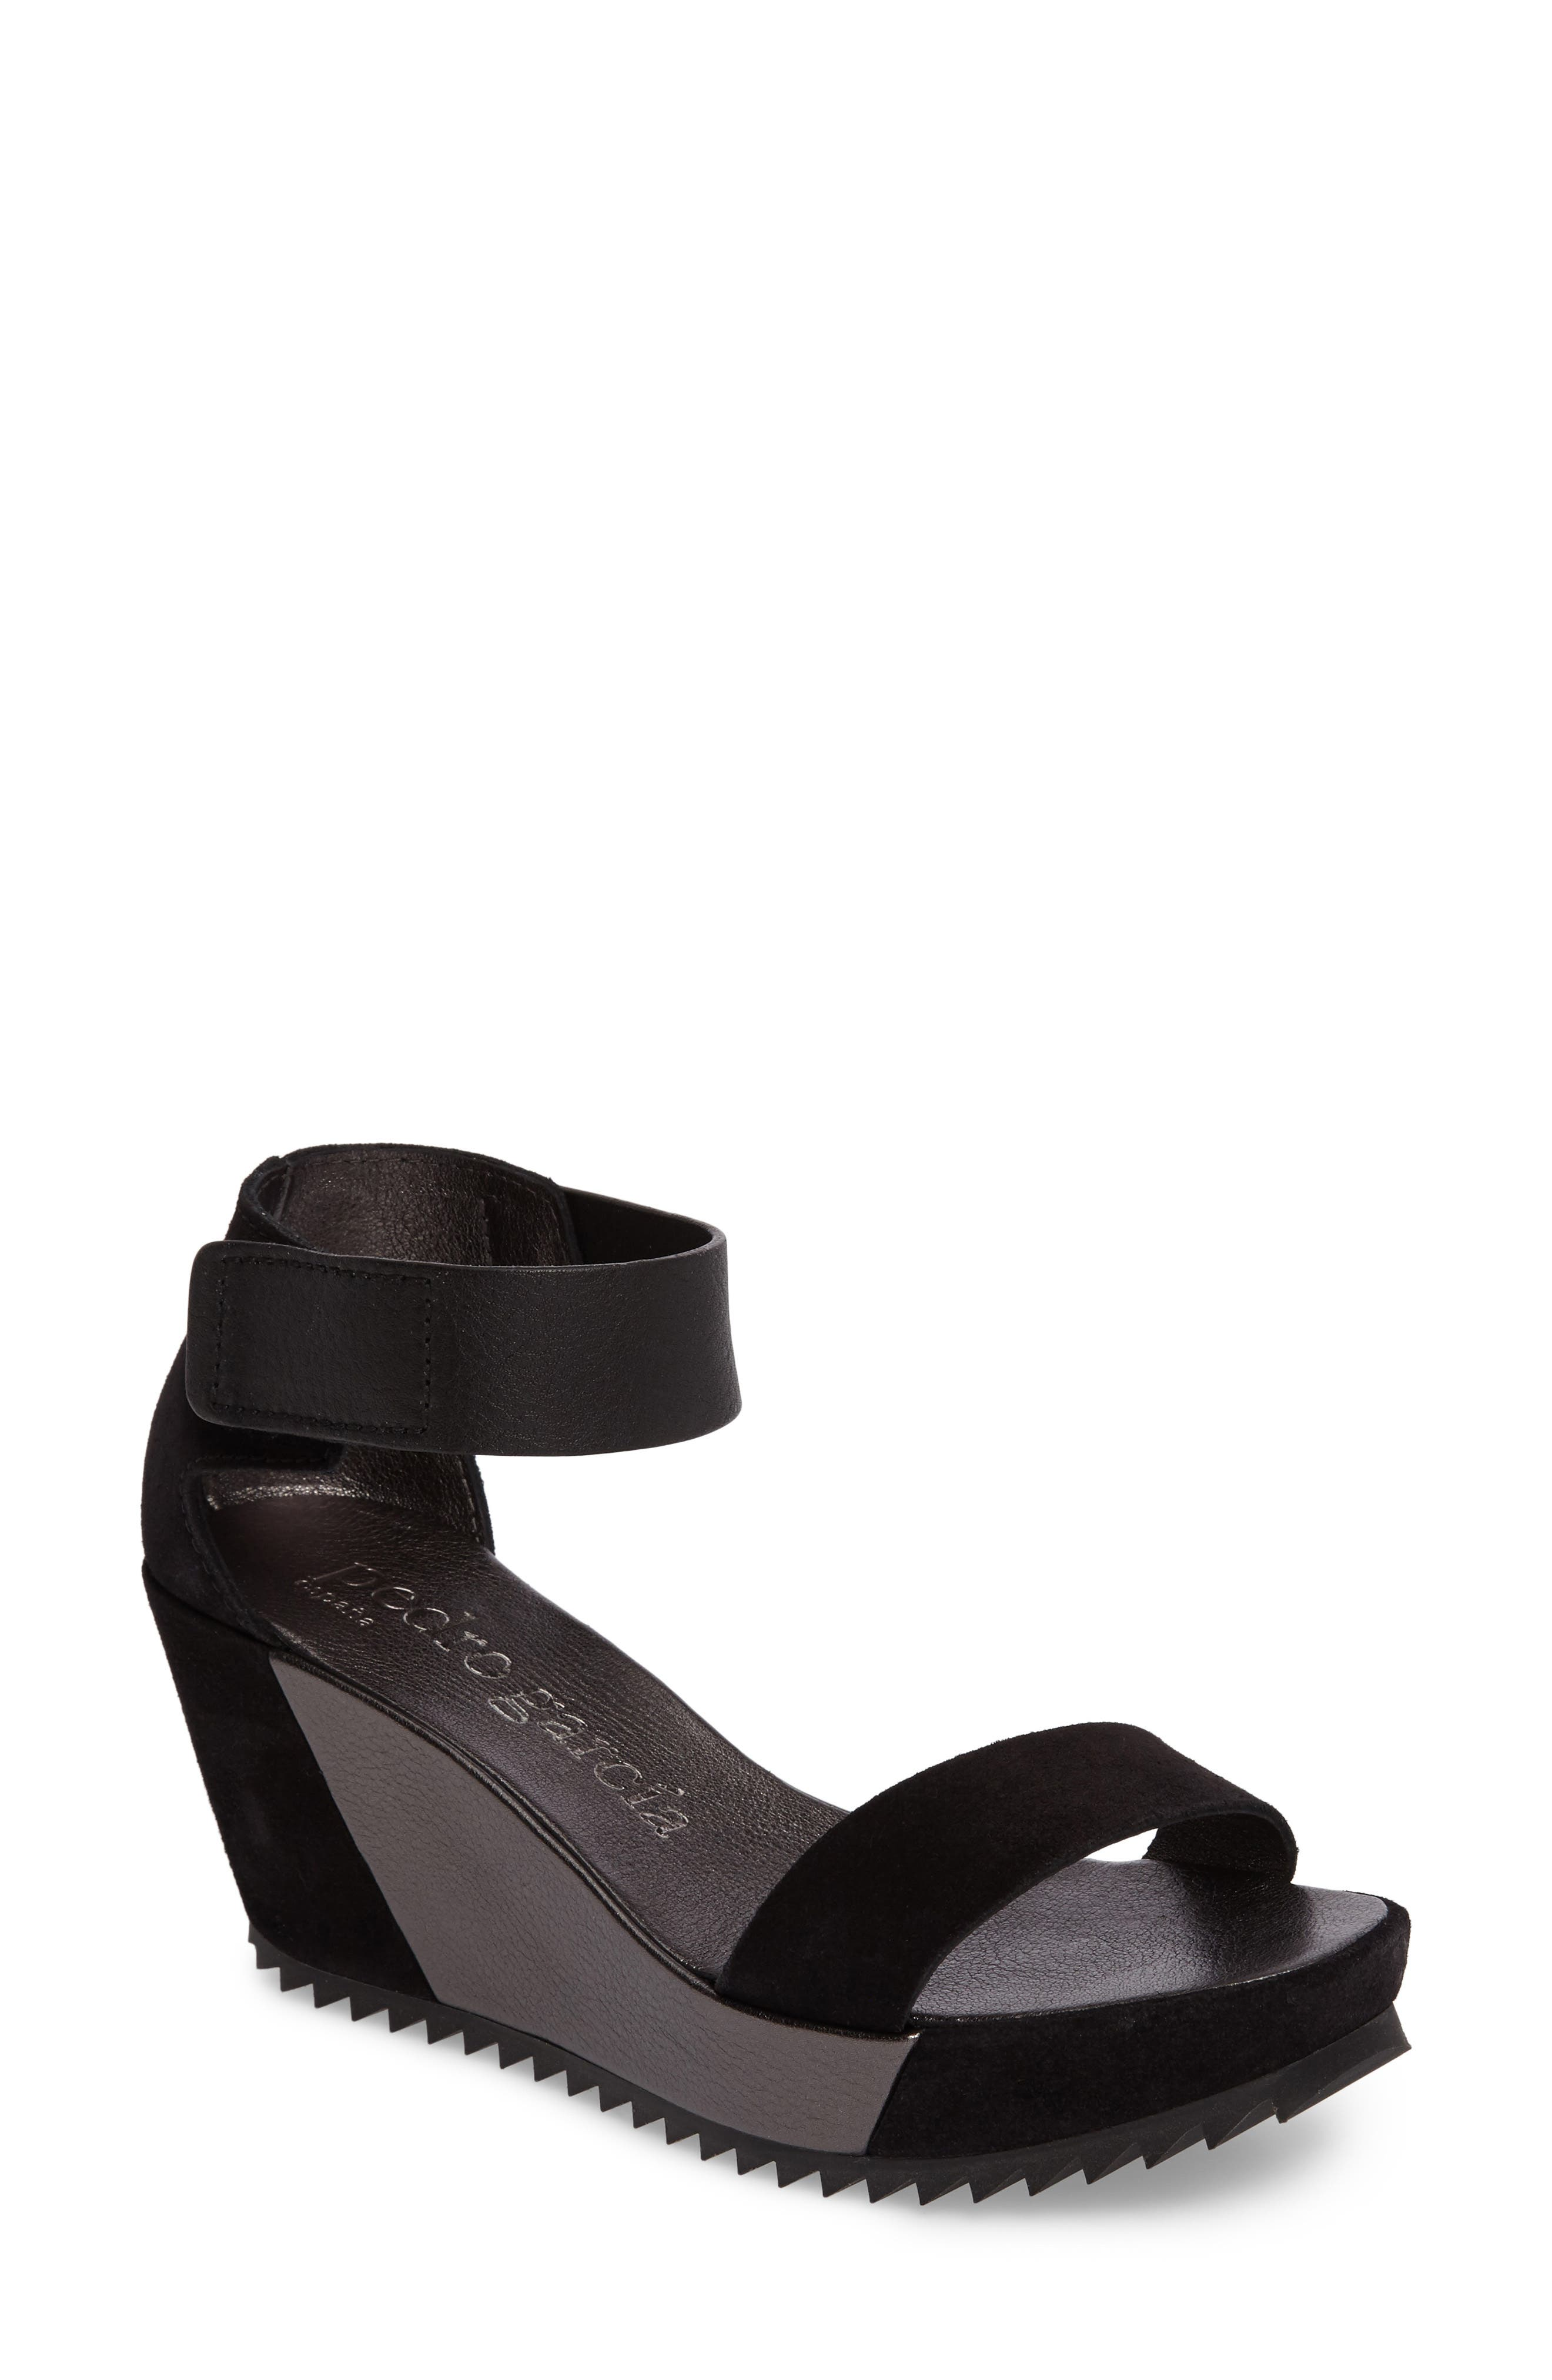 Fidelia Wedge Sandal,                         Main,                         color,